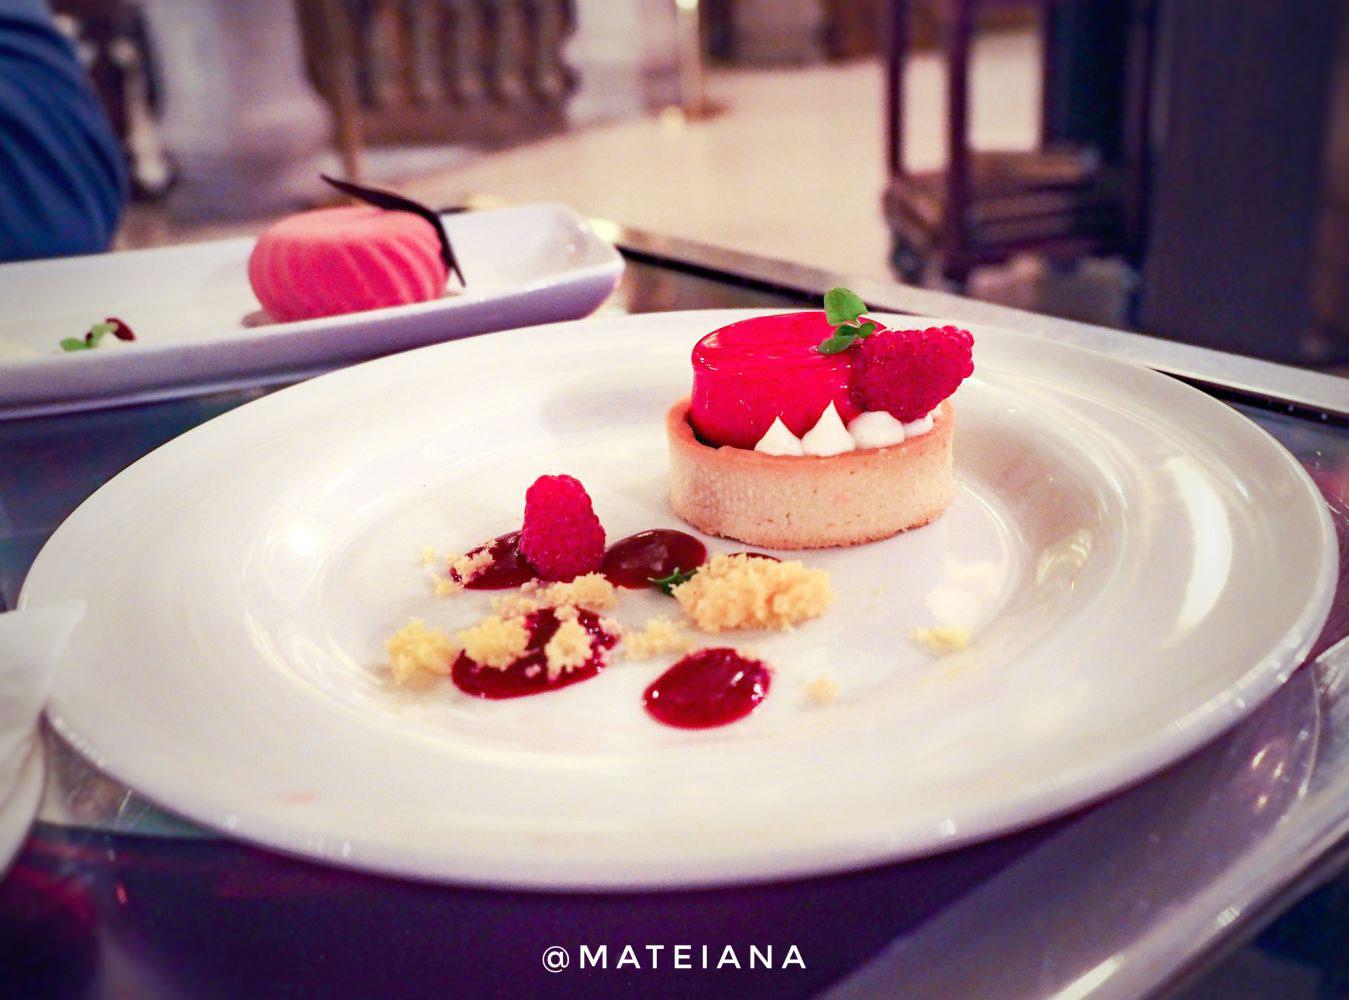 Desserts at New York Cafe Budapest - details